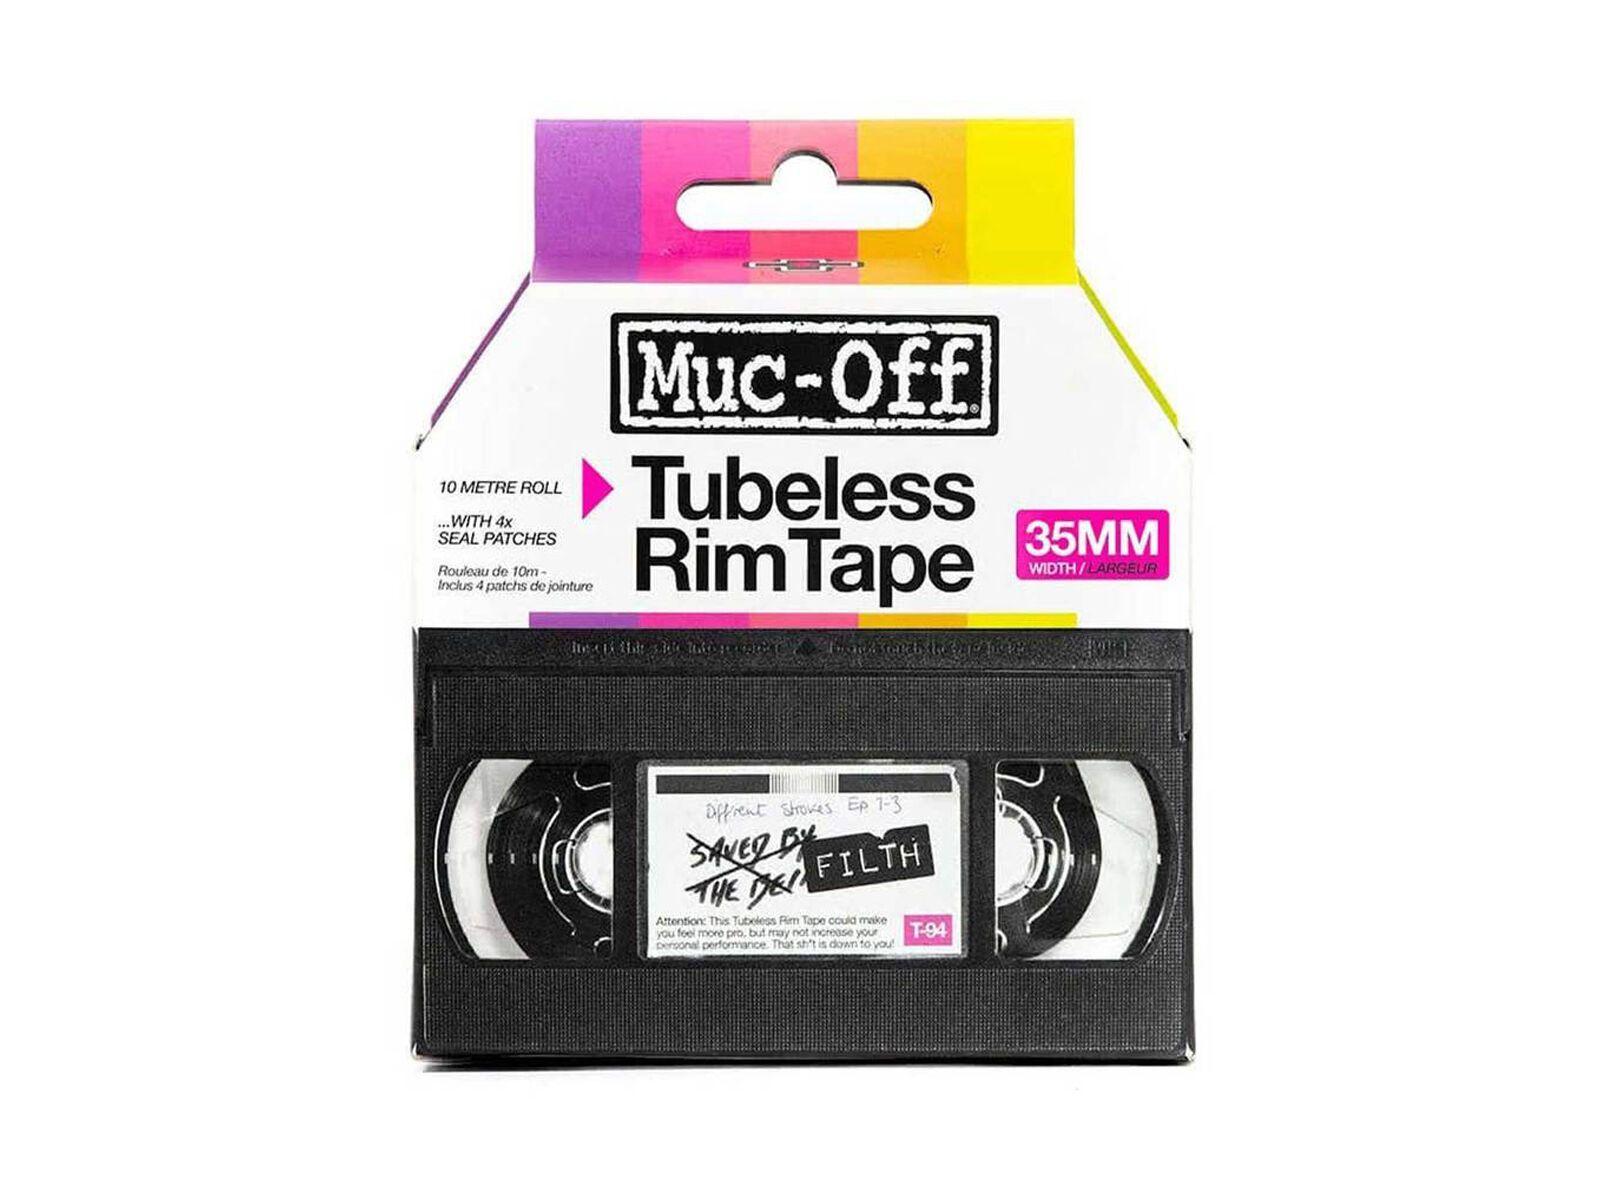 Muc-Off Tubeless Rim Tape - 35 mm - Felgenband MU-TIR-2068/36/35